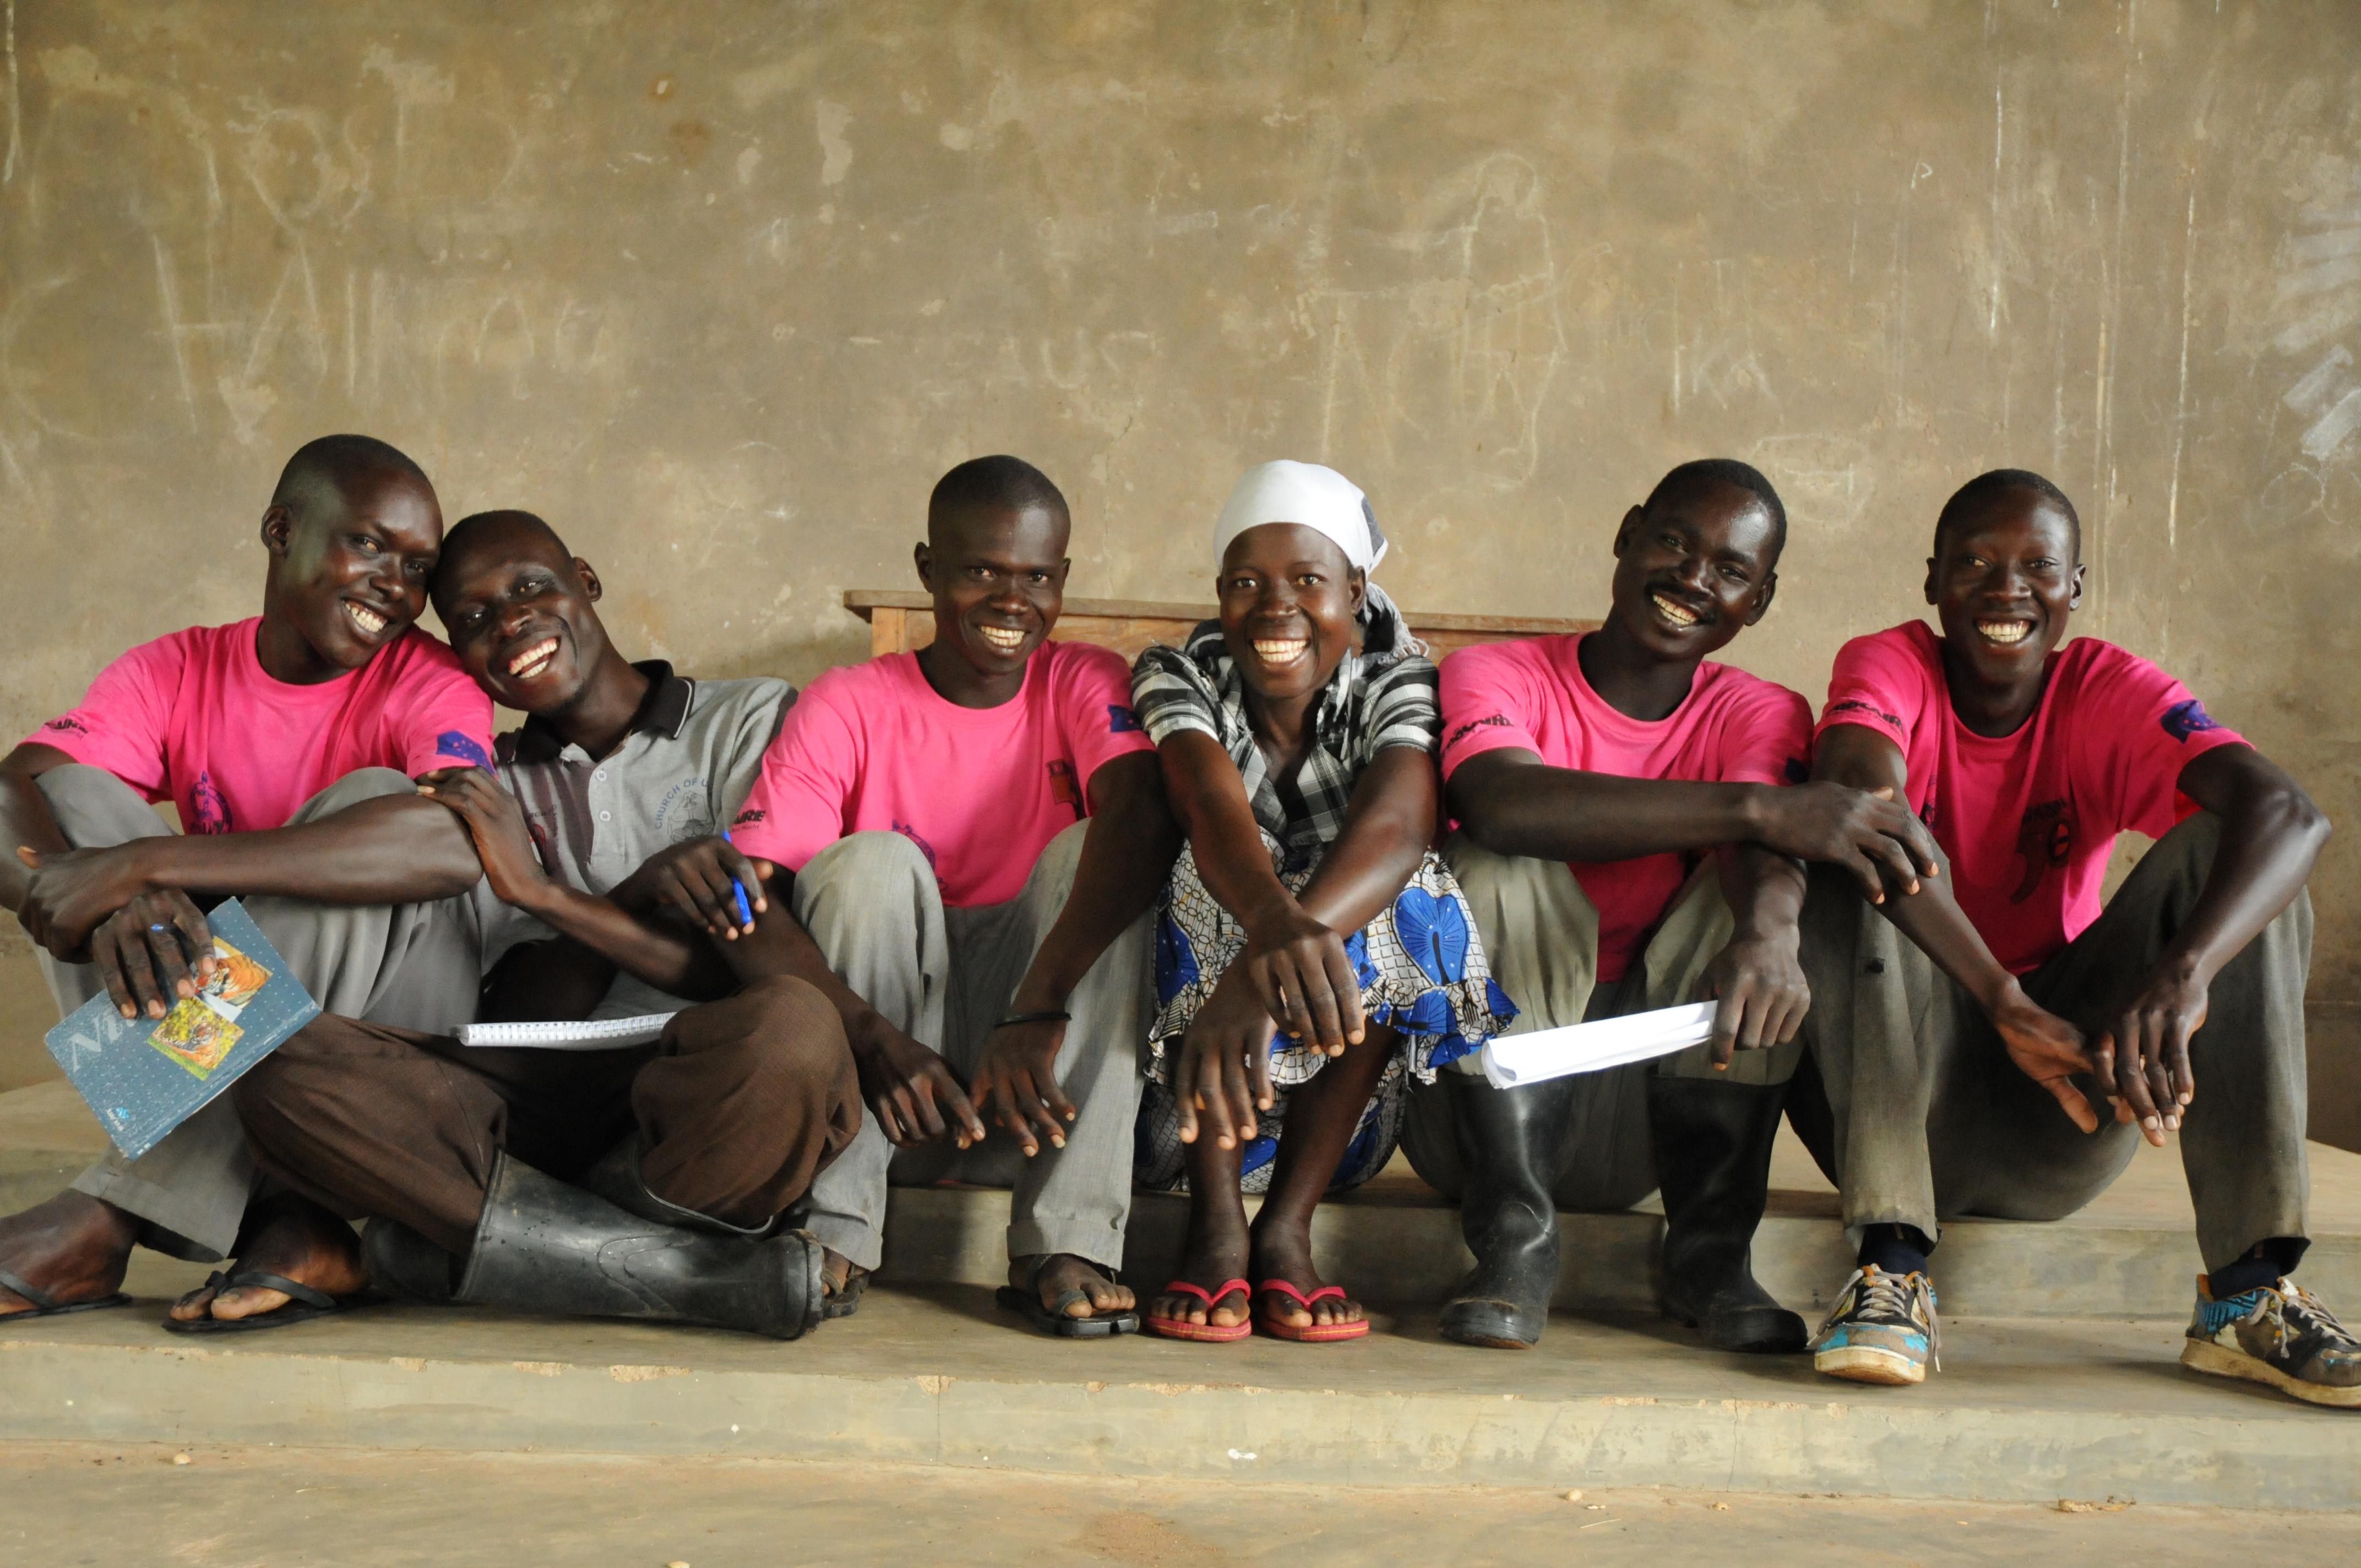 Dating in college uganda wandegeya